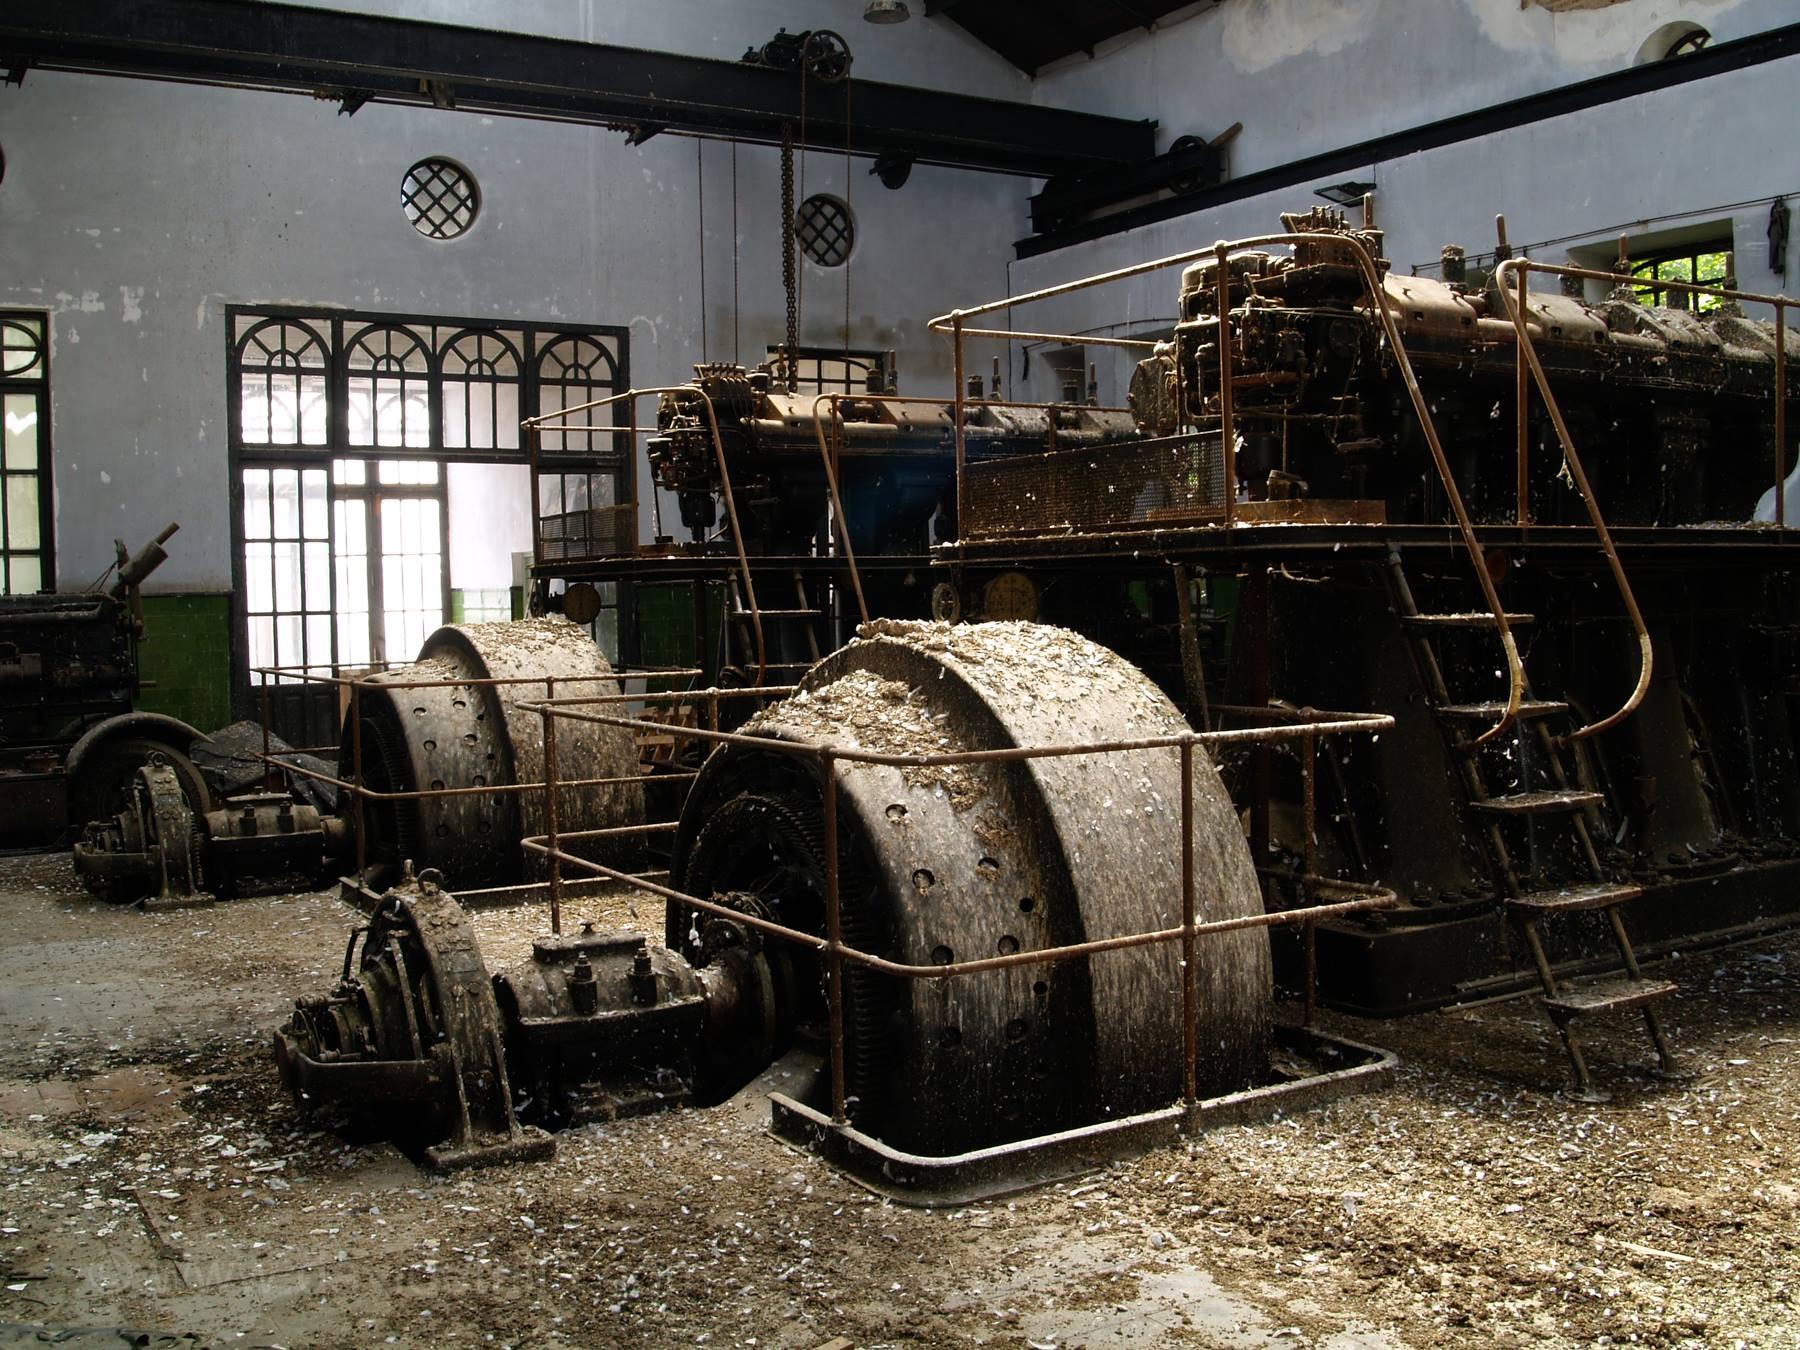 La Fábrica de armas de Toledo - Leyendas de Toledo